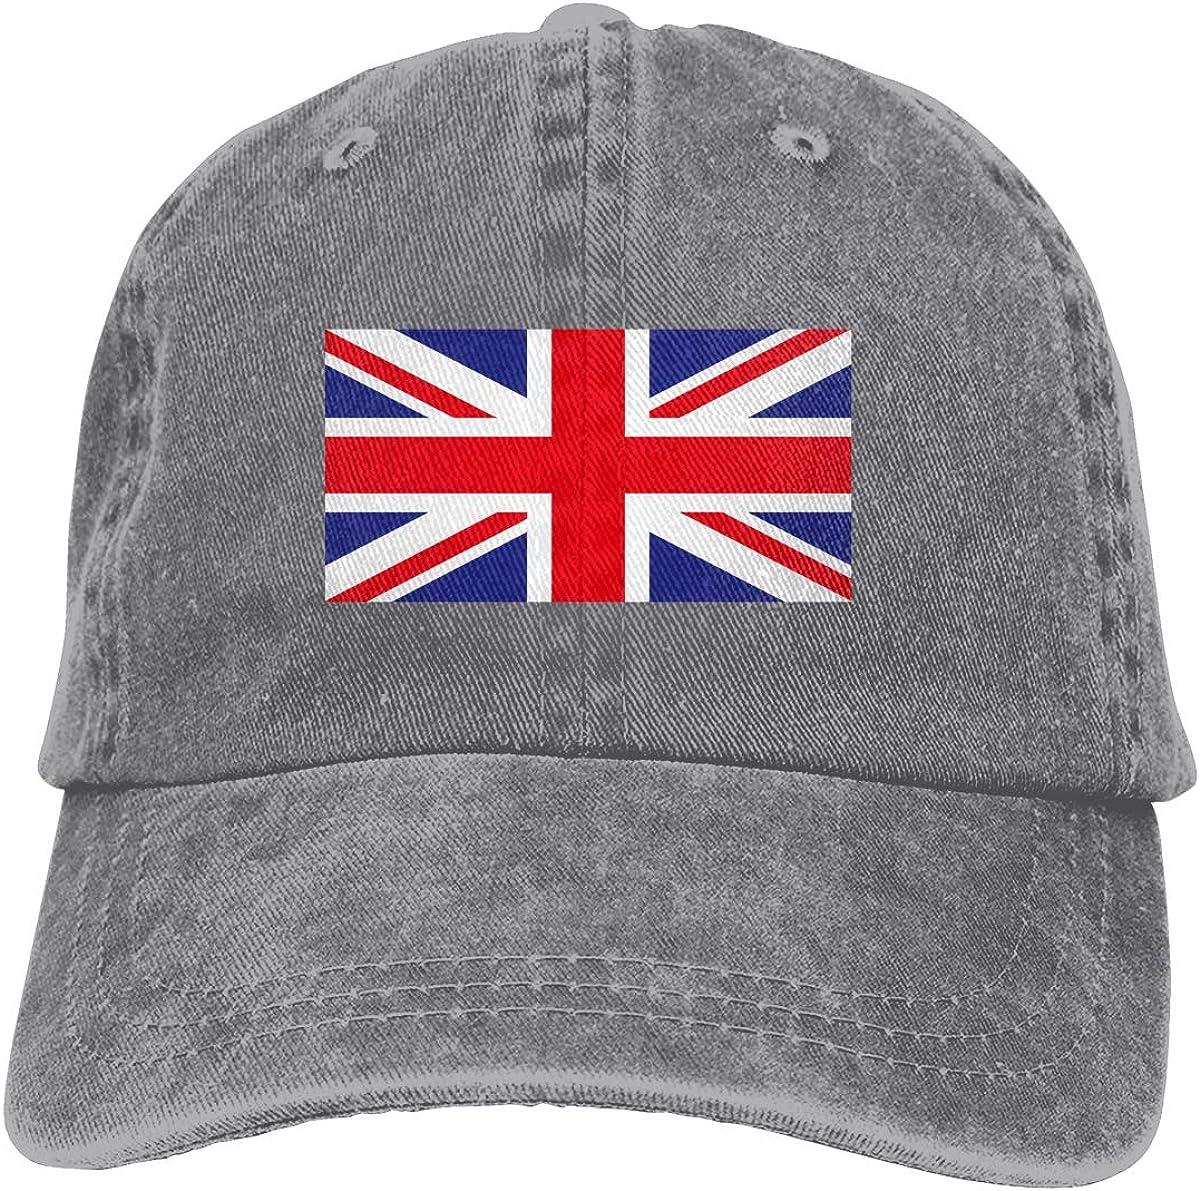 Flag England Denim Hat Adjustable Plain Cap Baseball Caps